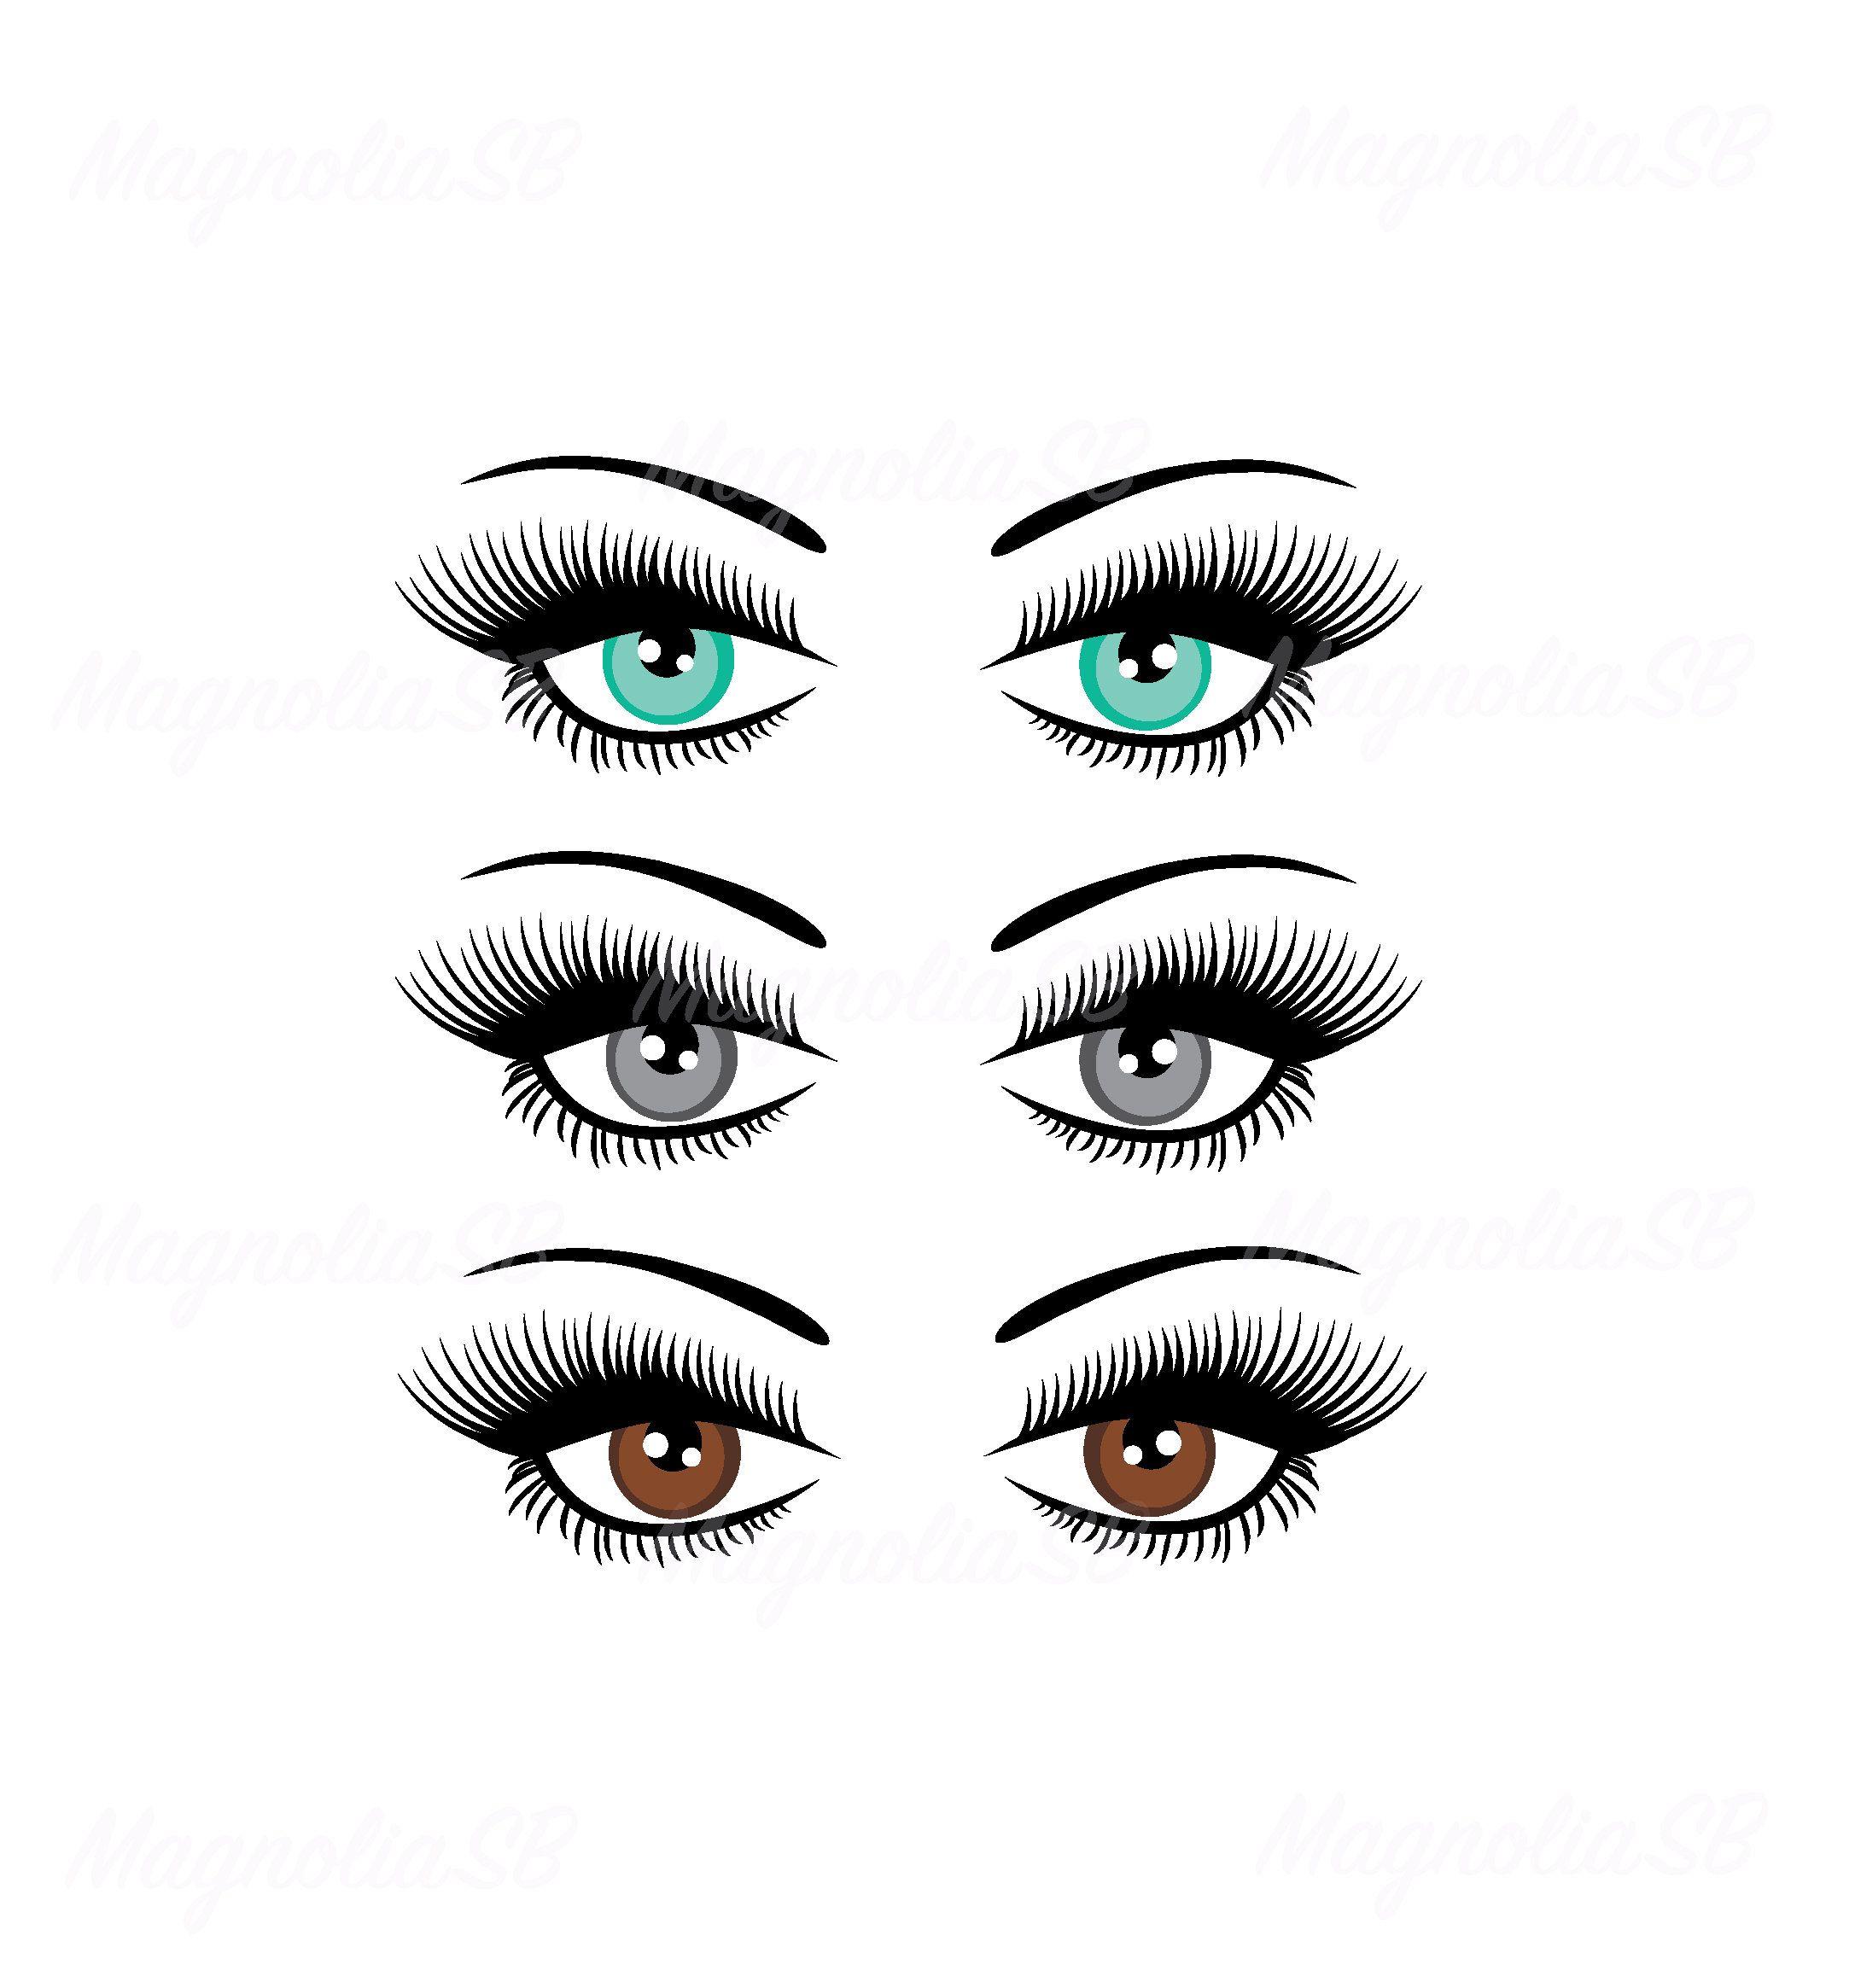 Eyeballs clipart eye shape. Pin on svg dxf